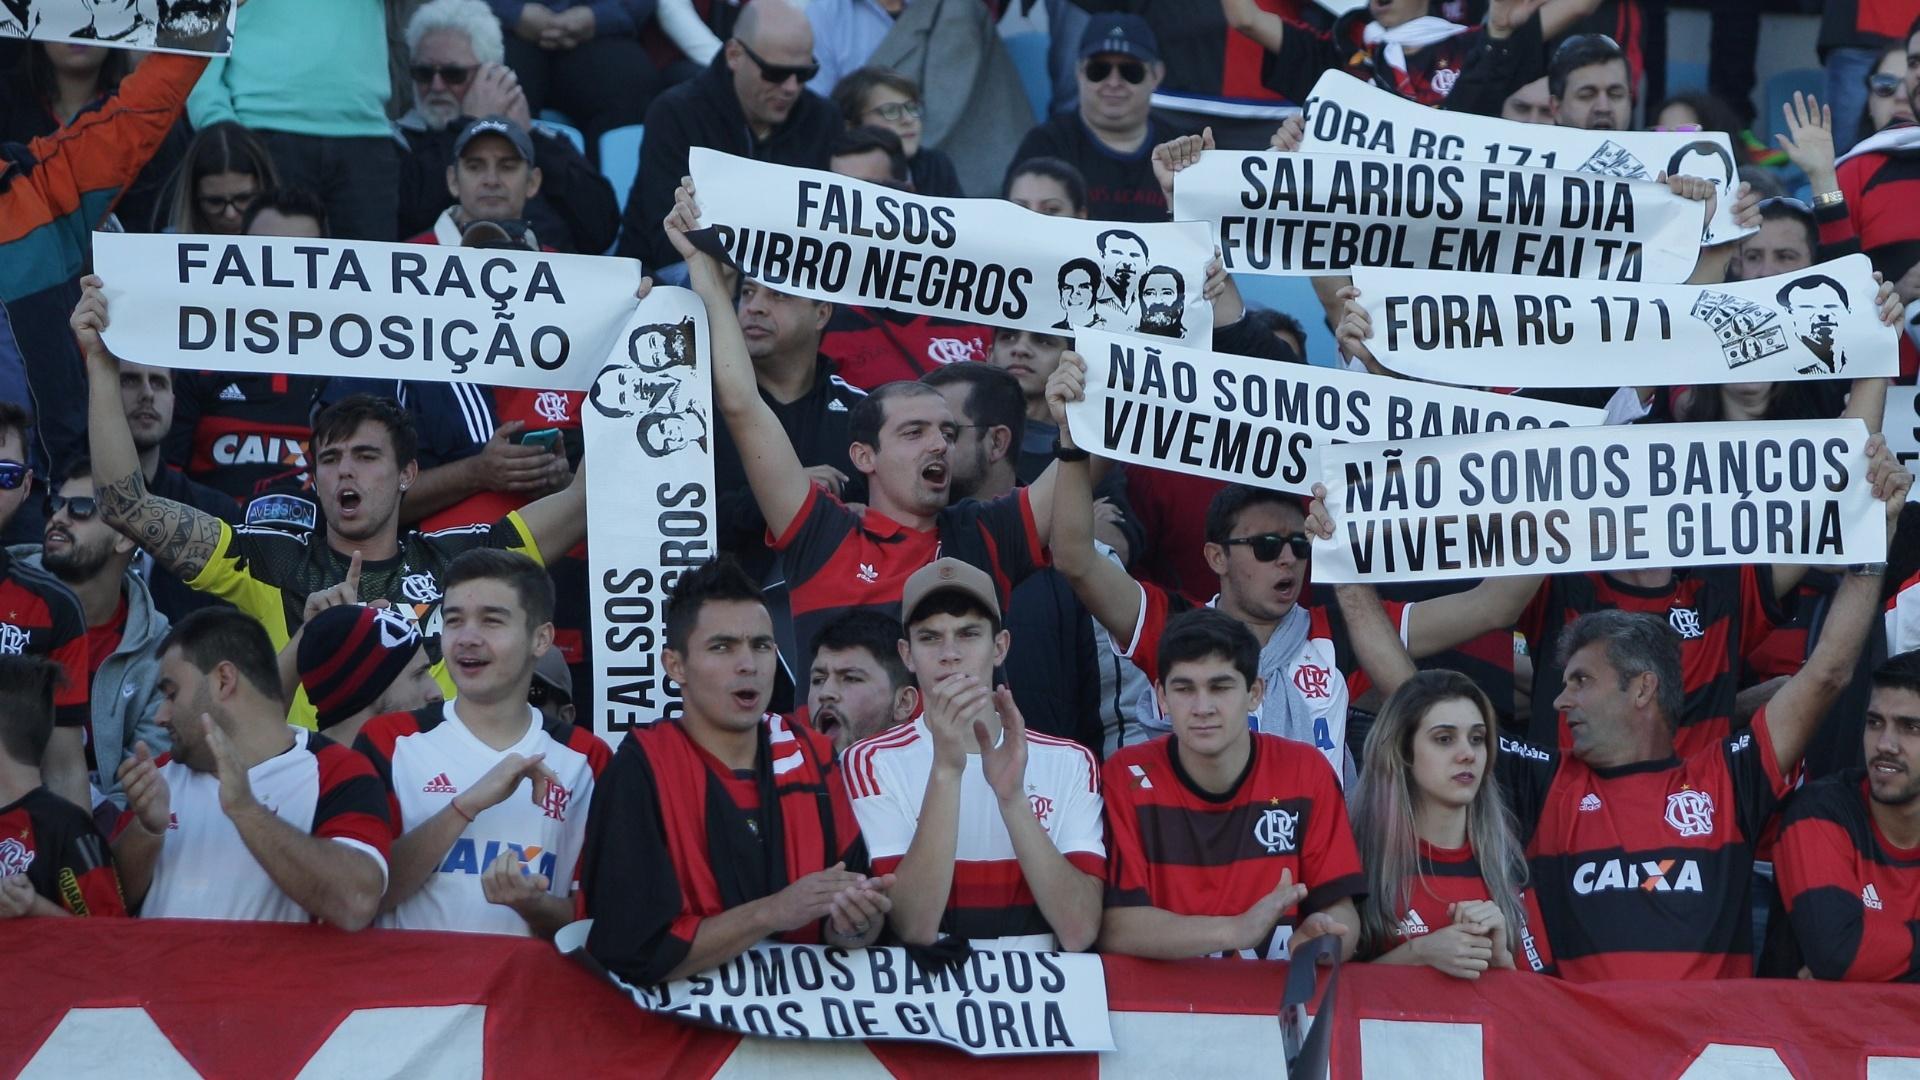 Torcida do Flamengo protesta contra má fase da equipe